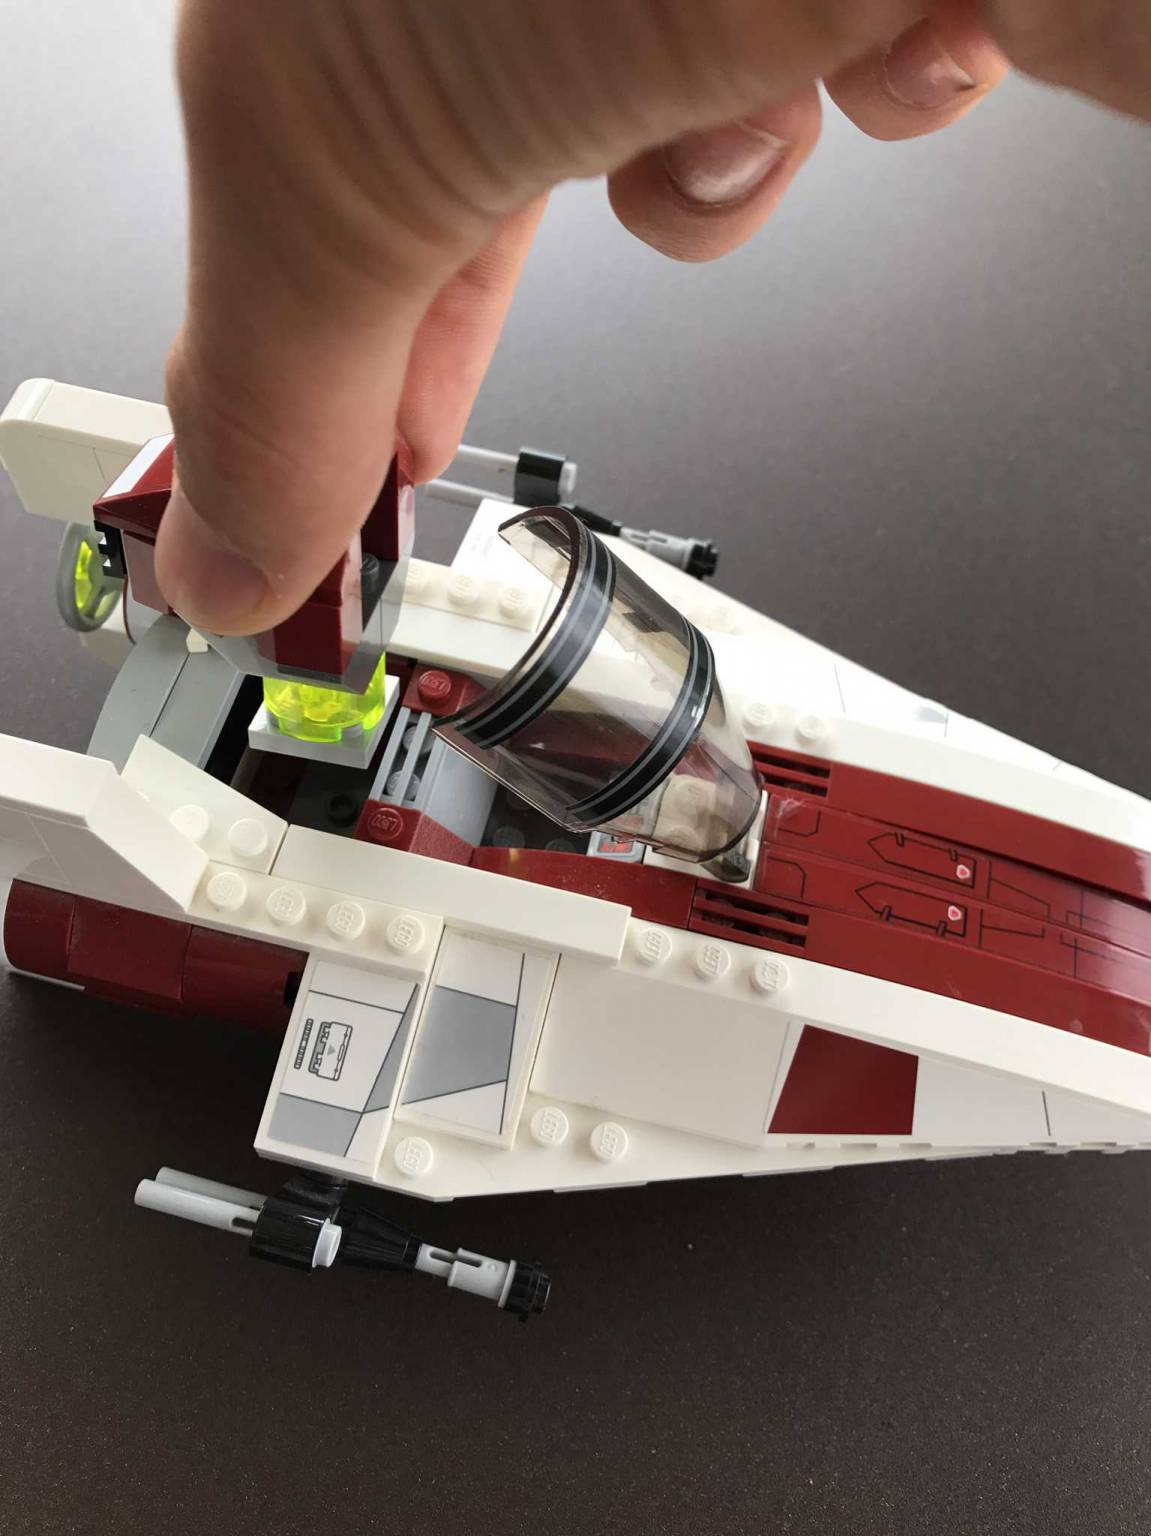 Lego star wars vaisseau spatial lego star wars - Image star wars vaisseau ...